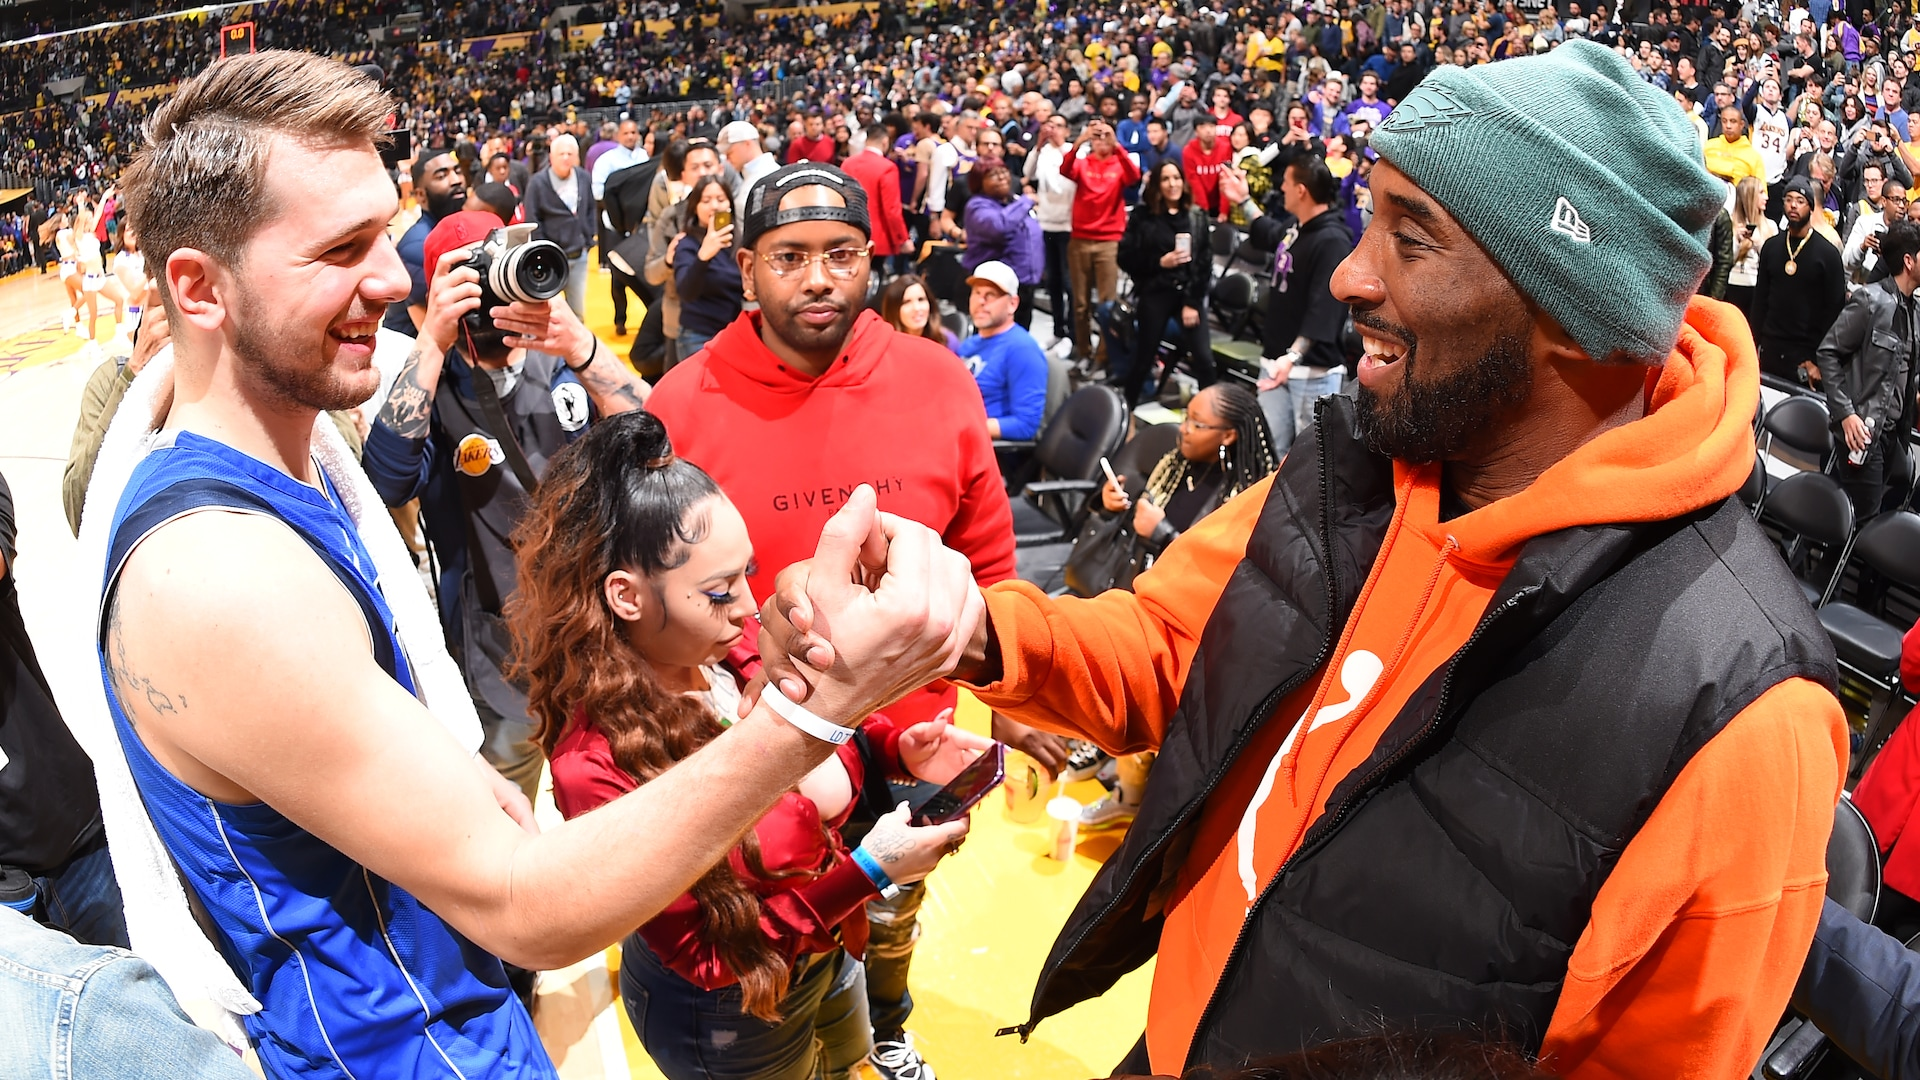 Mavericks to retire No. 24 in honor of Kobe Bryant